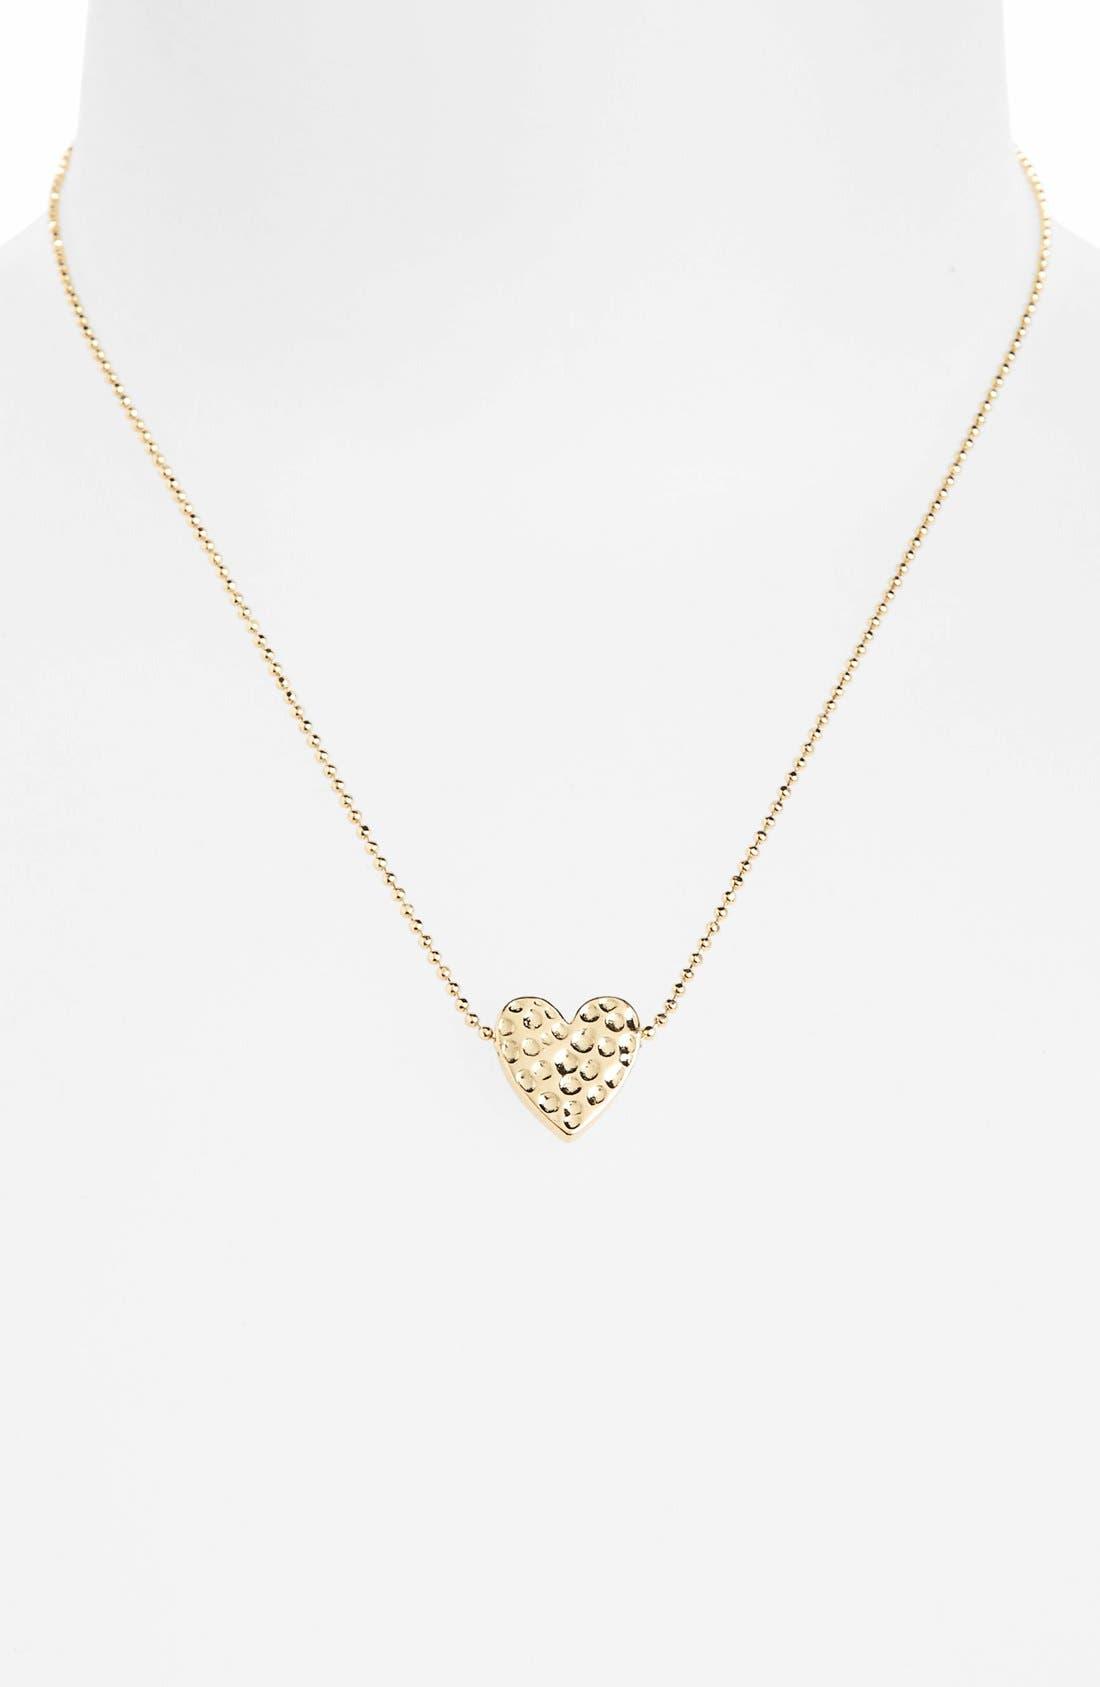 Main Image - Topshop 'Beaten Heart' Necklace